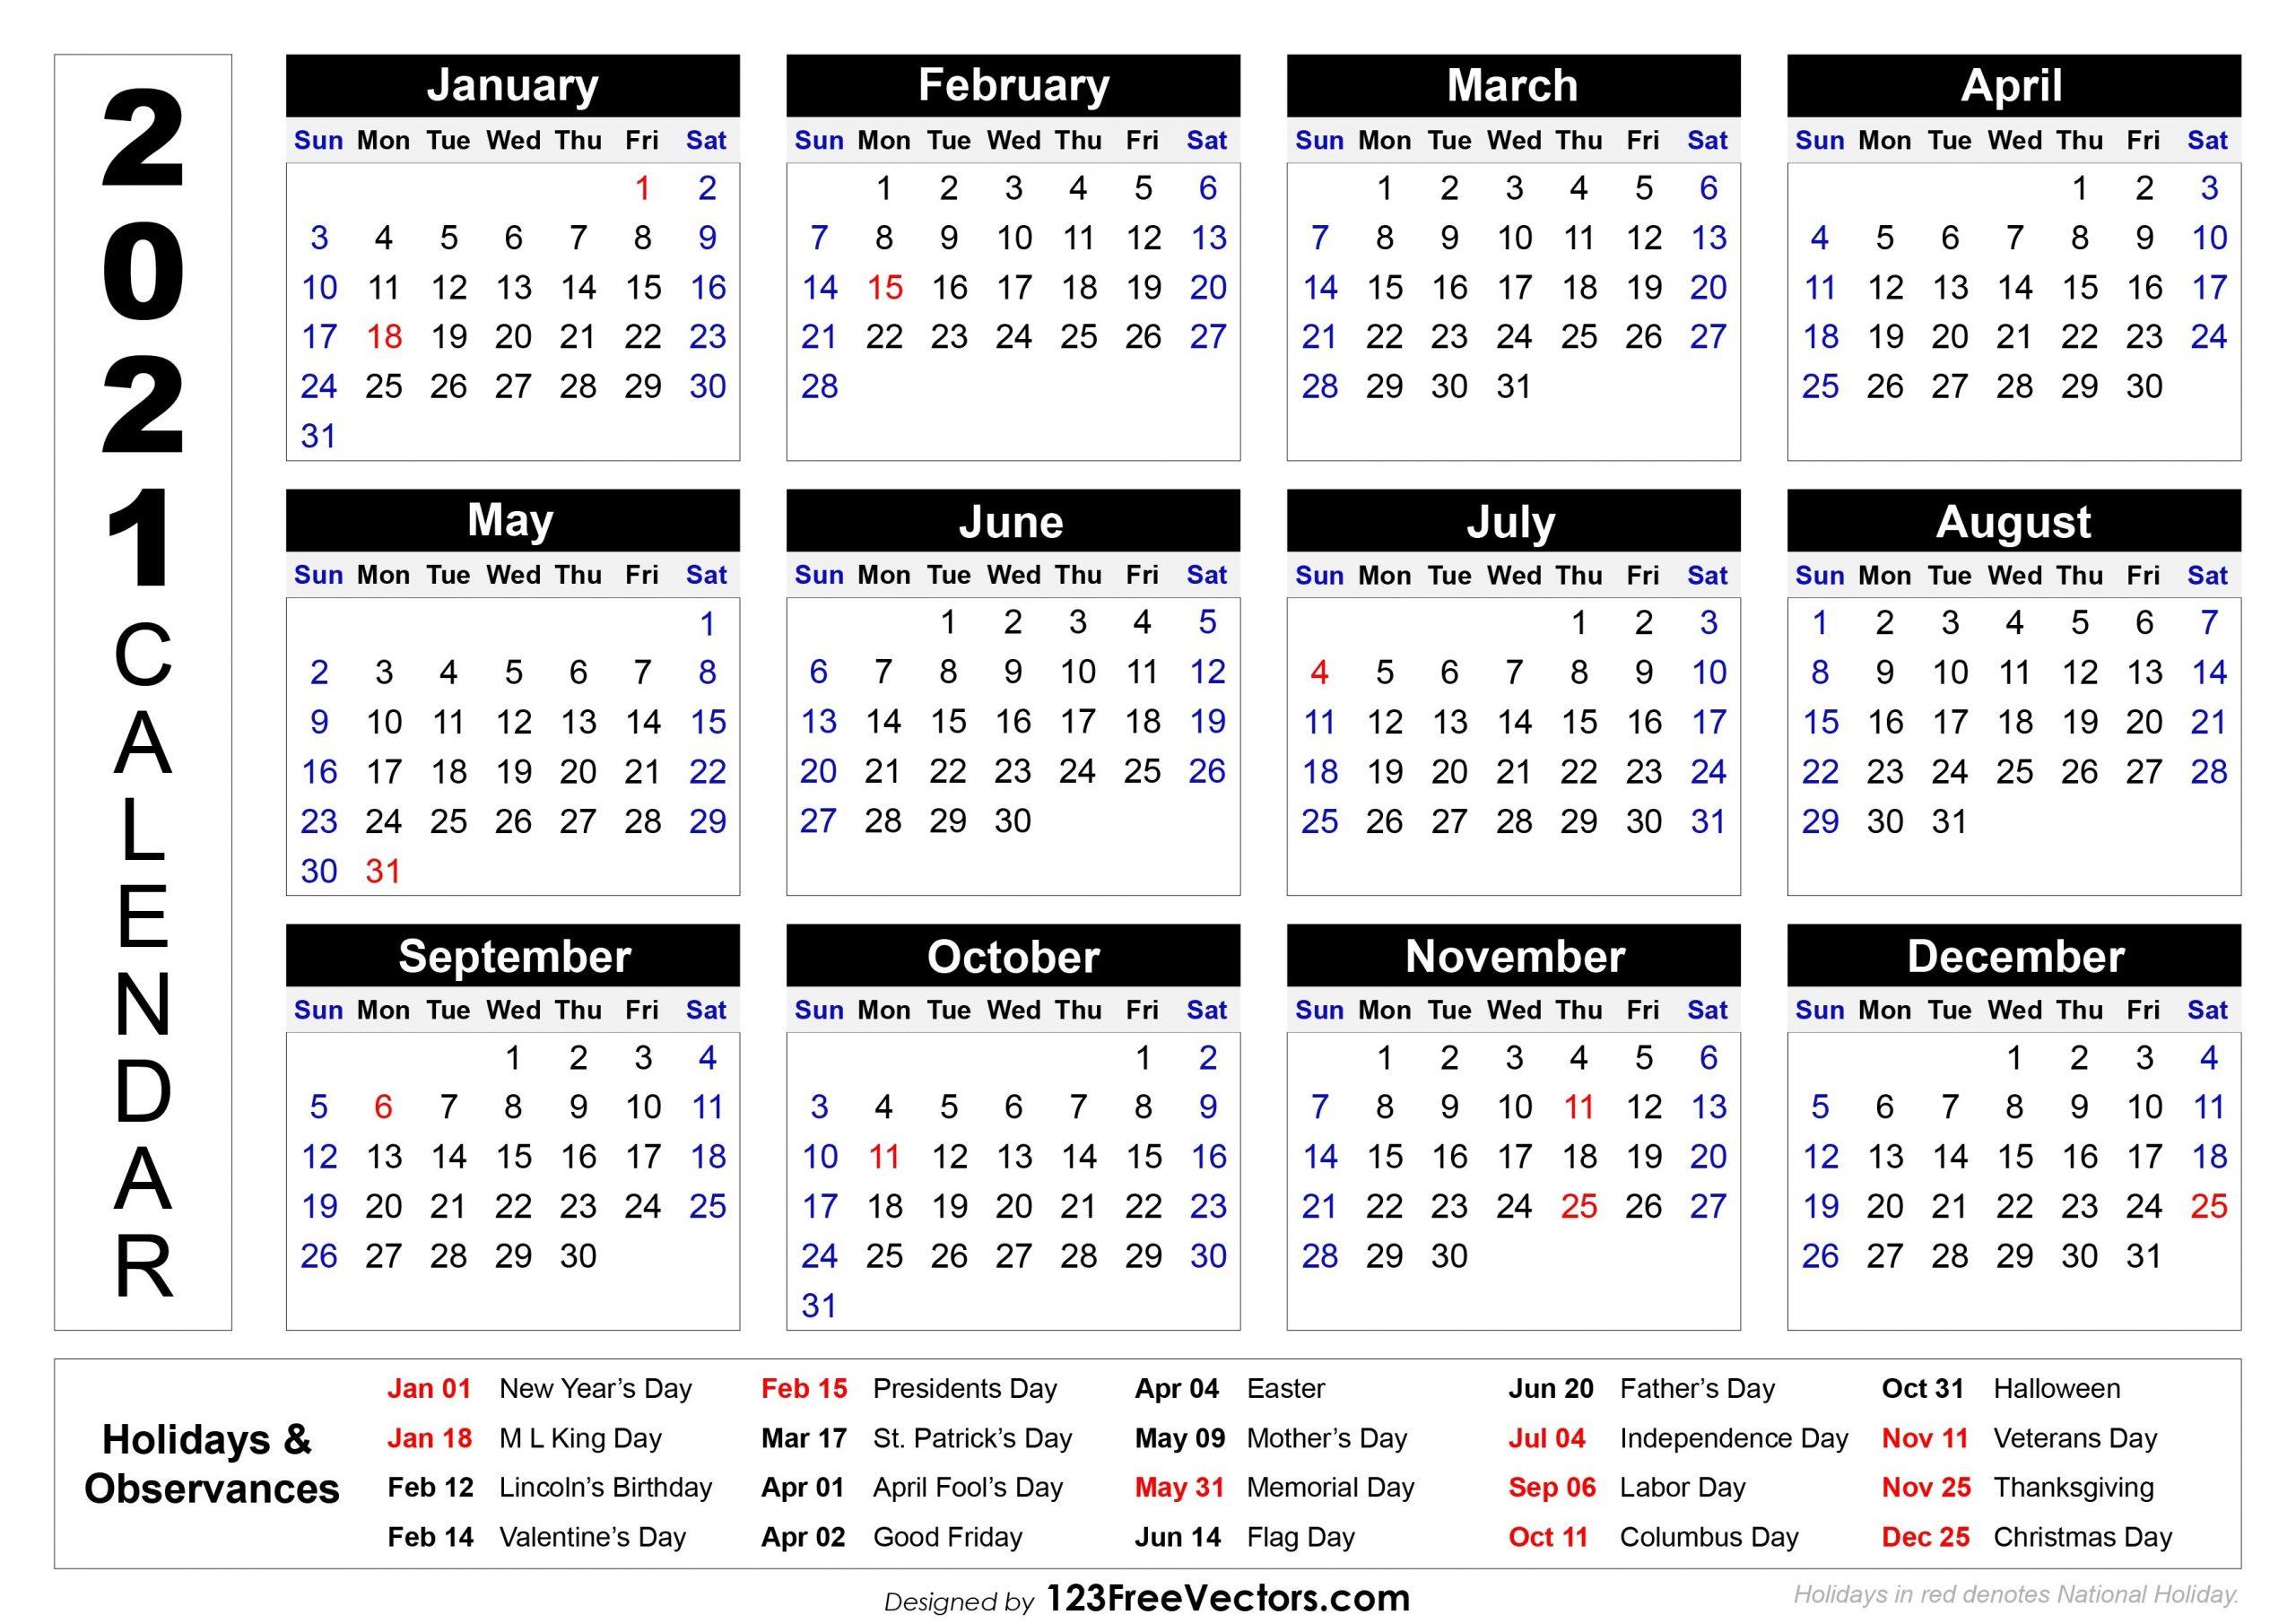 Free 2021 Printable Calendar With Holidays in Calendar 2019 2021 2021 Printable Free